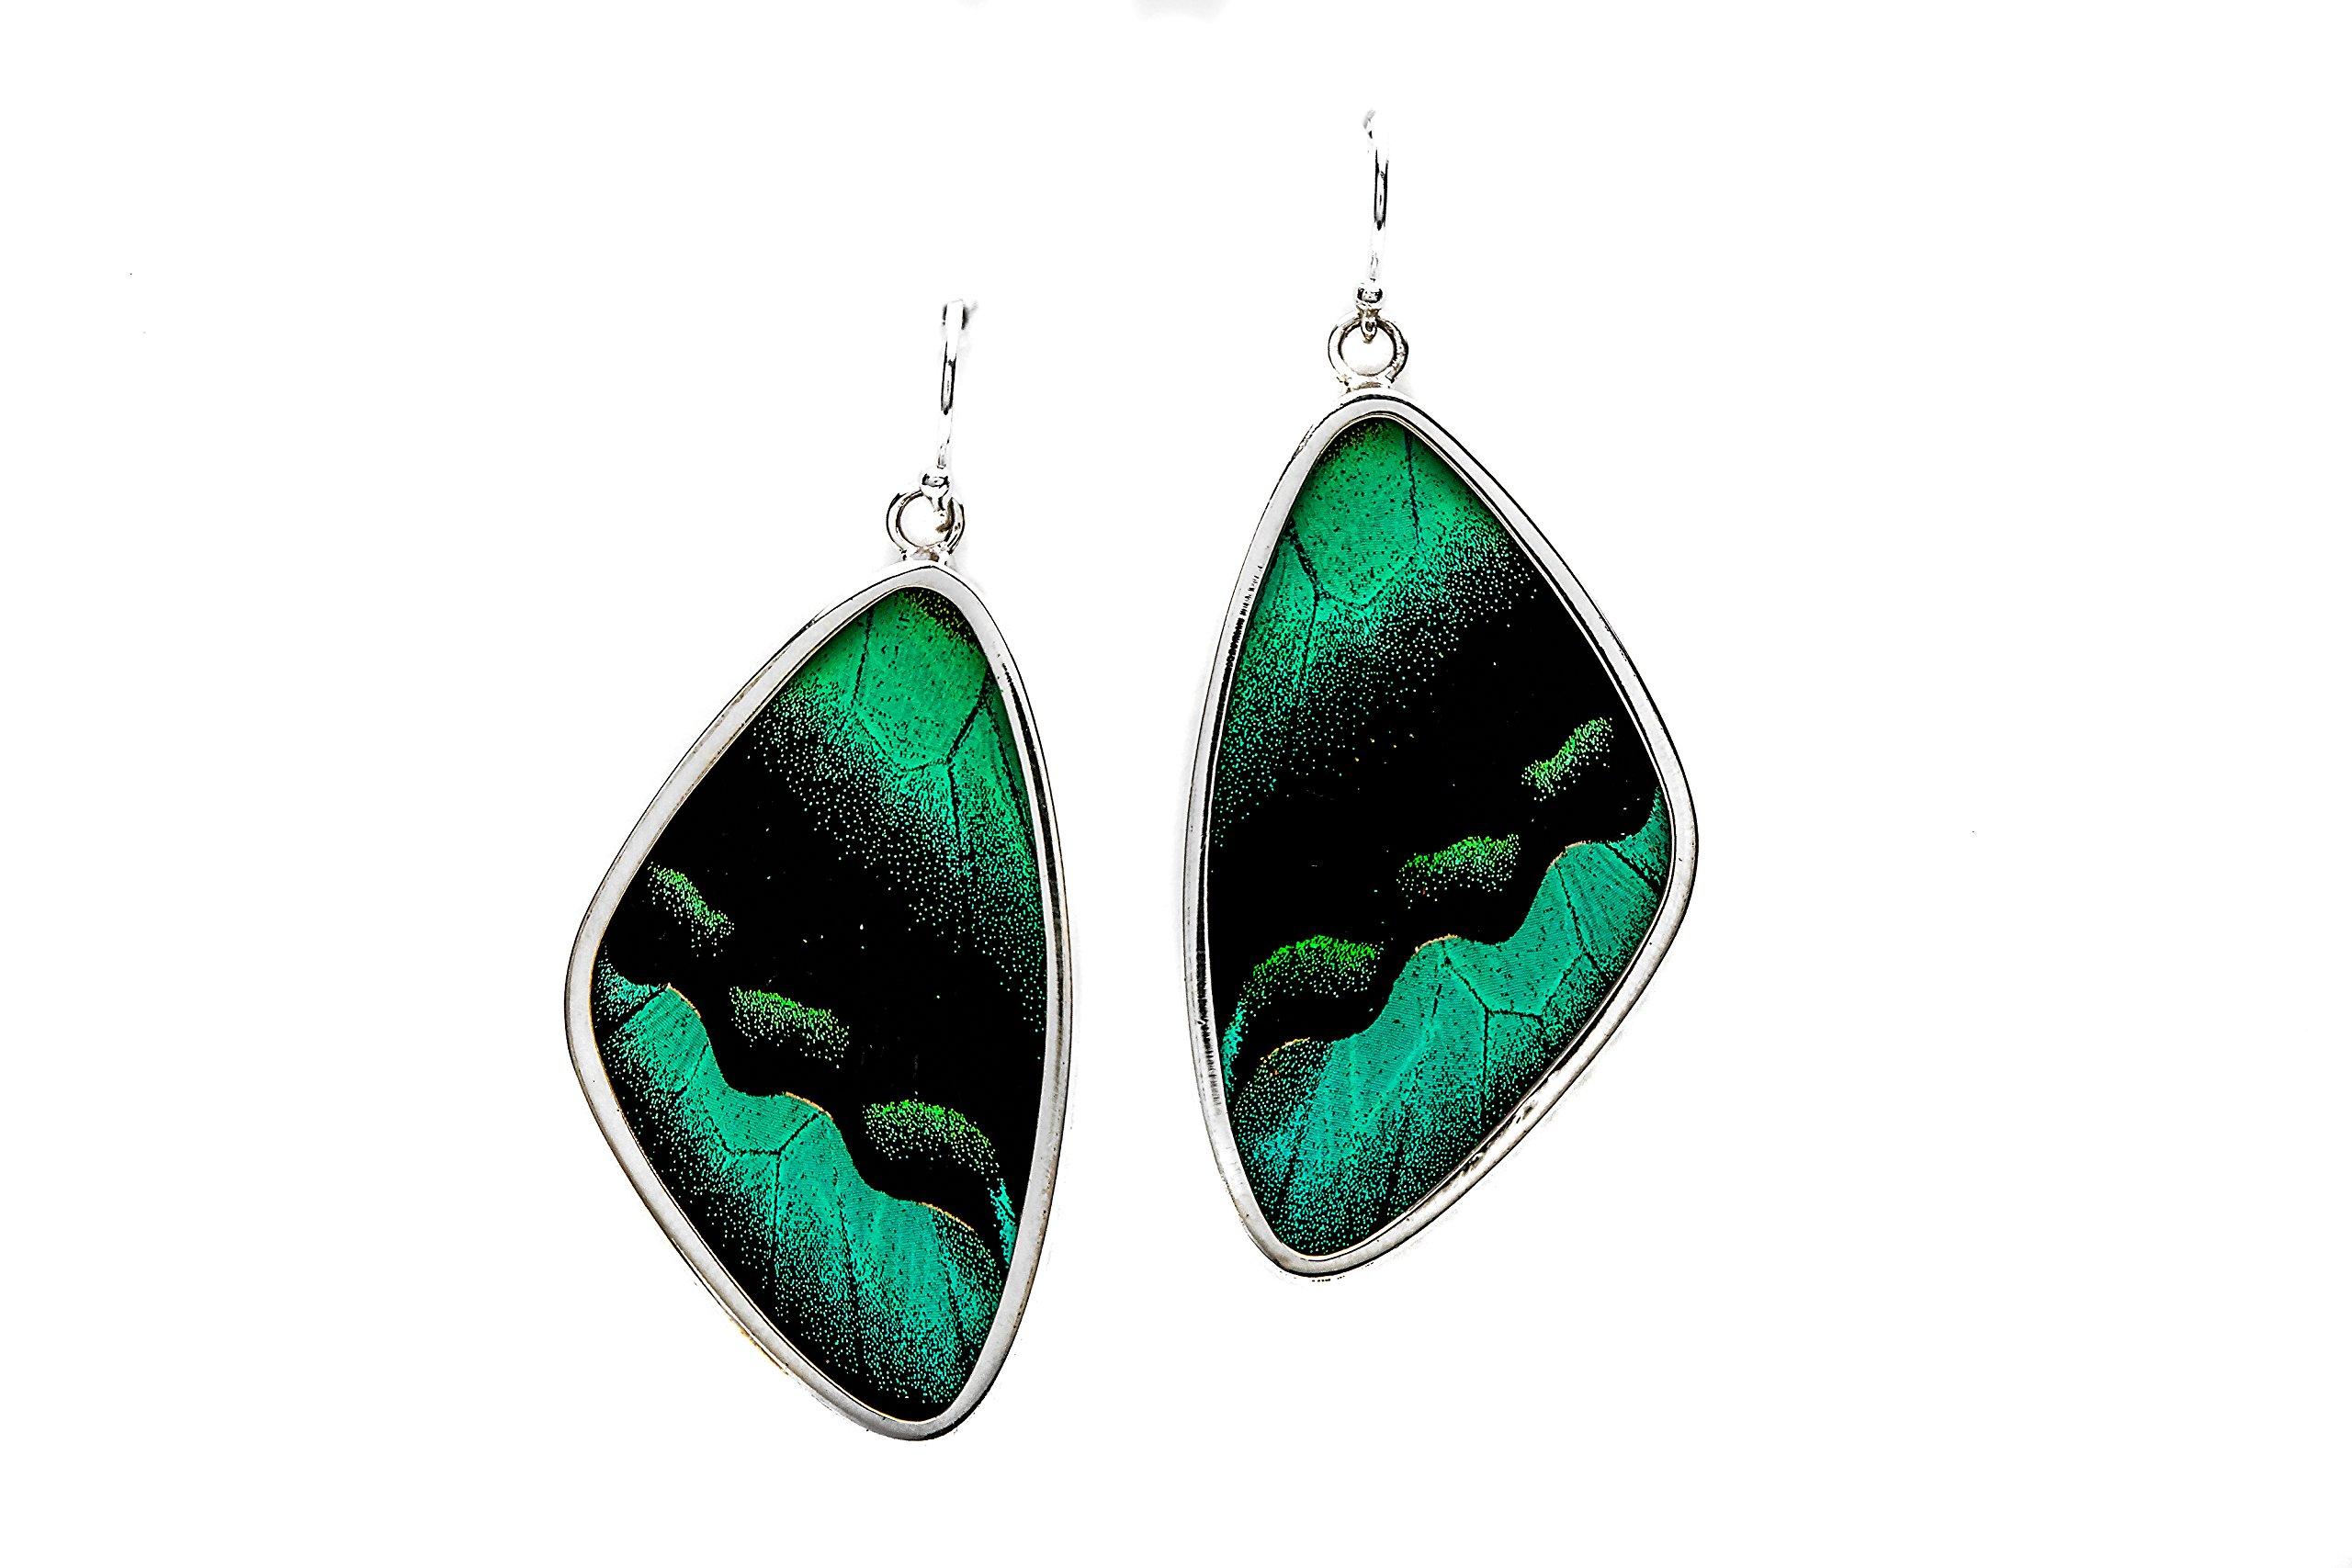 Real Butterfly Wing Earrings in Sterling Silver - Style #7